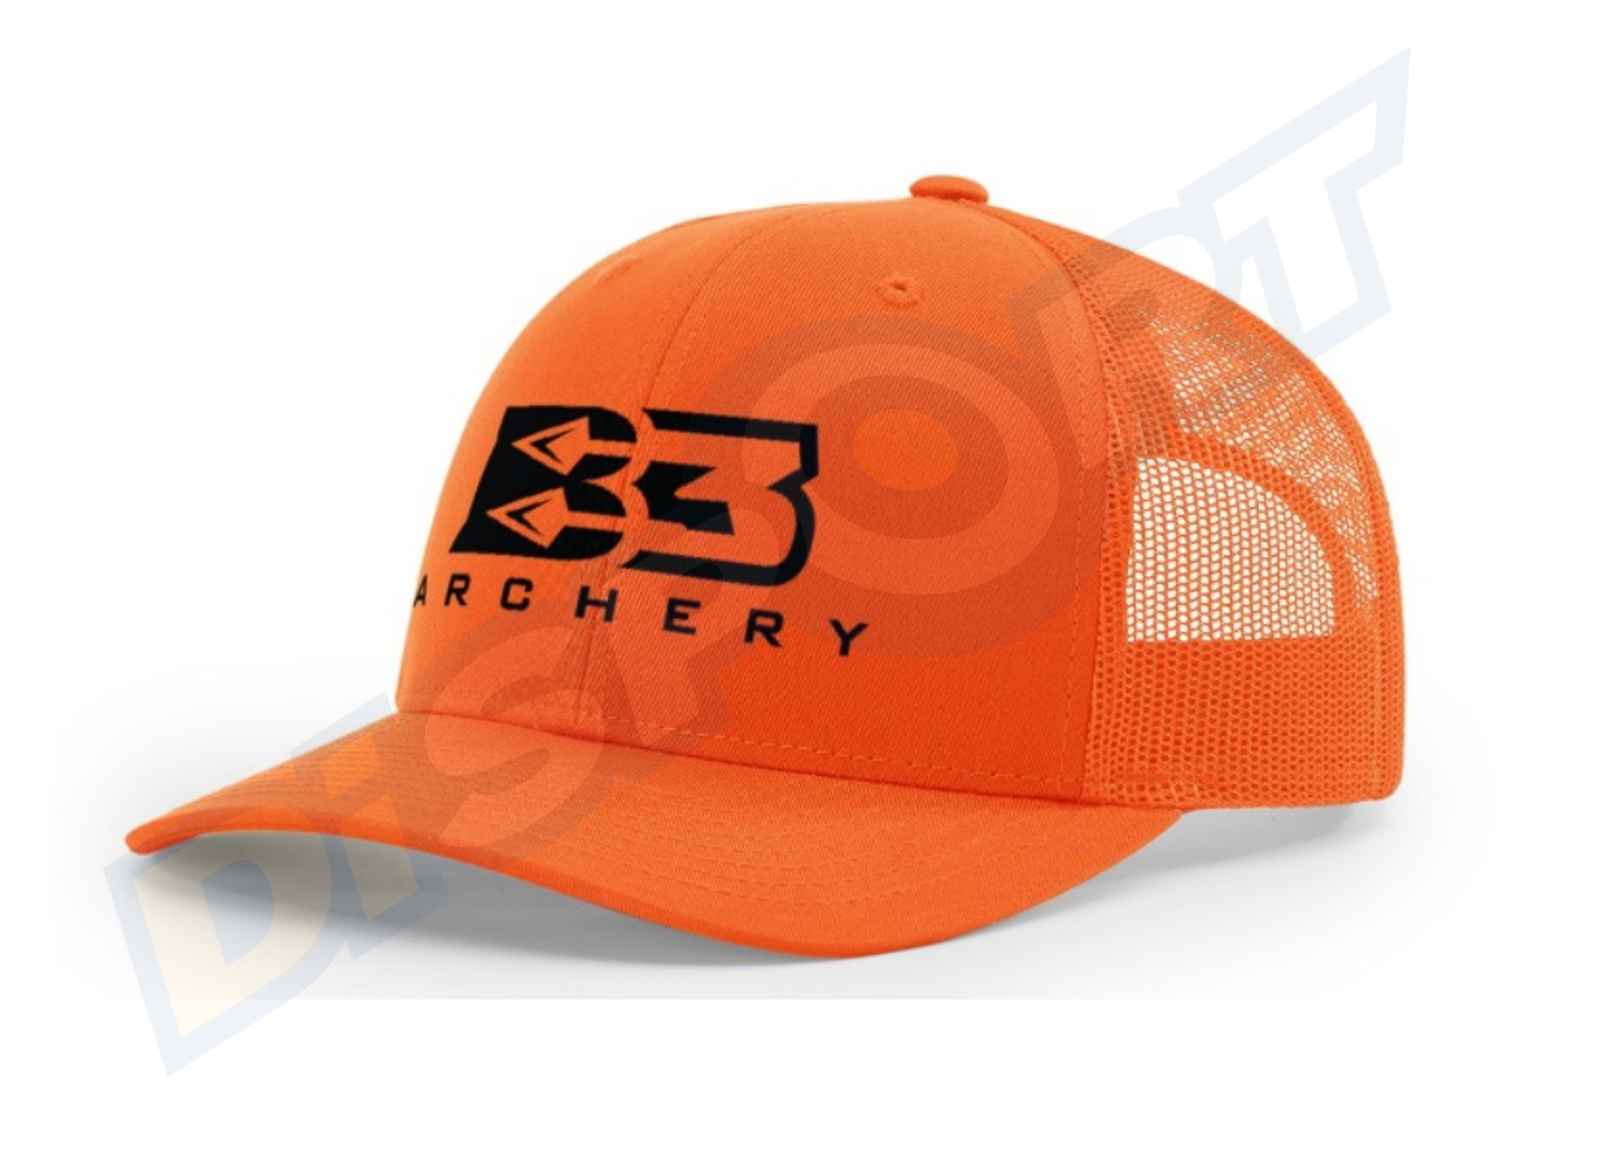 B3 ARCHERY ORANGE CAP